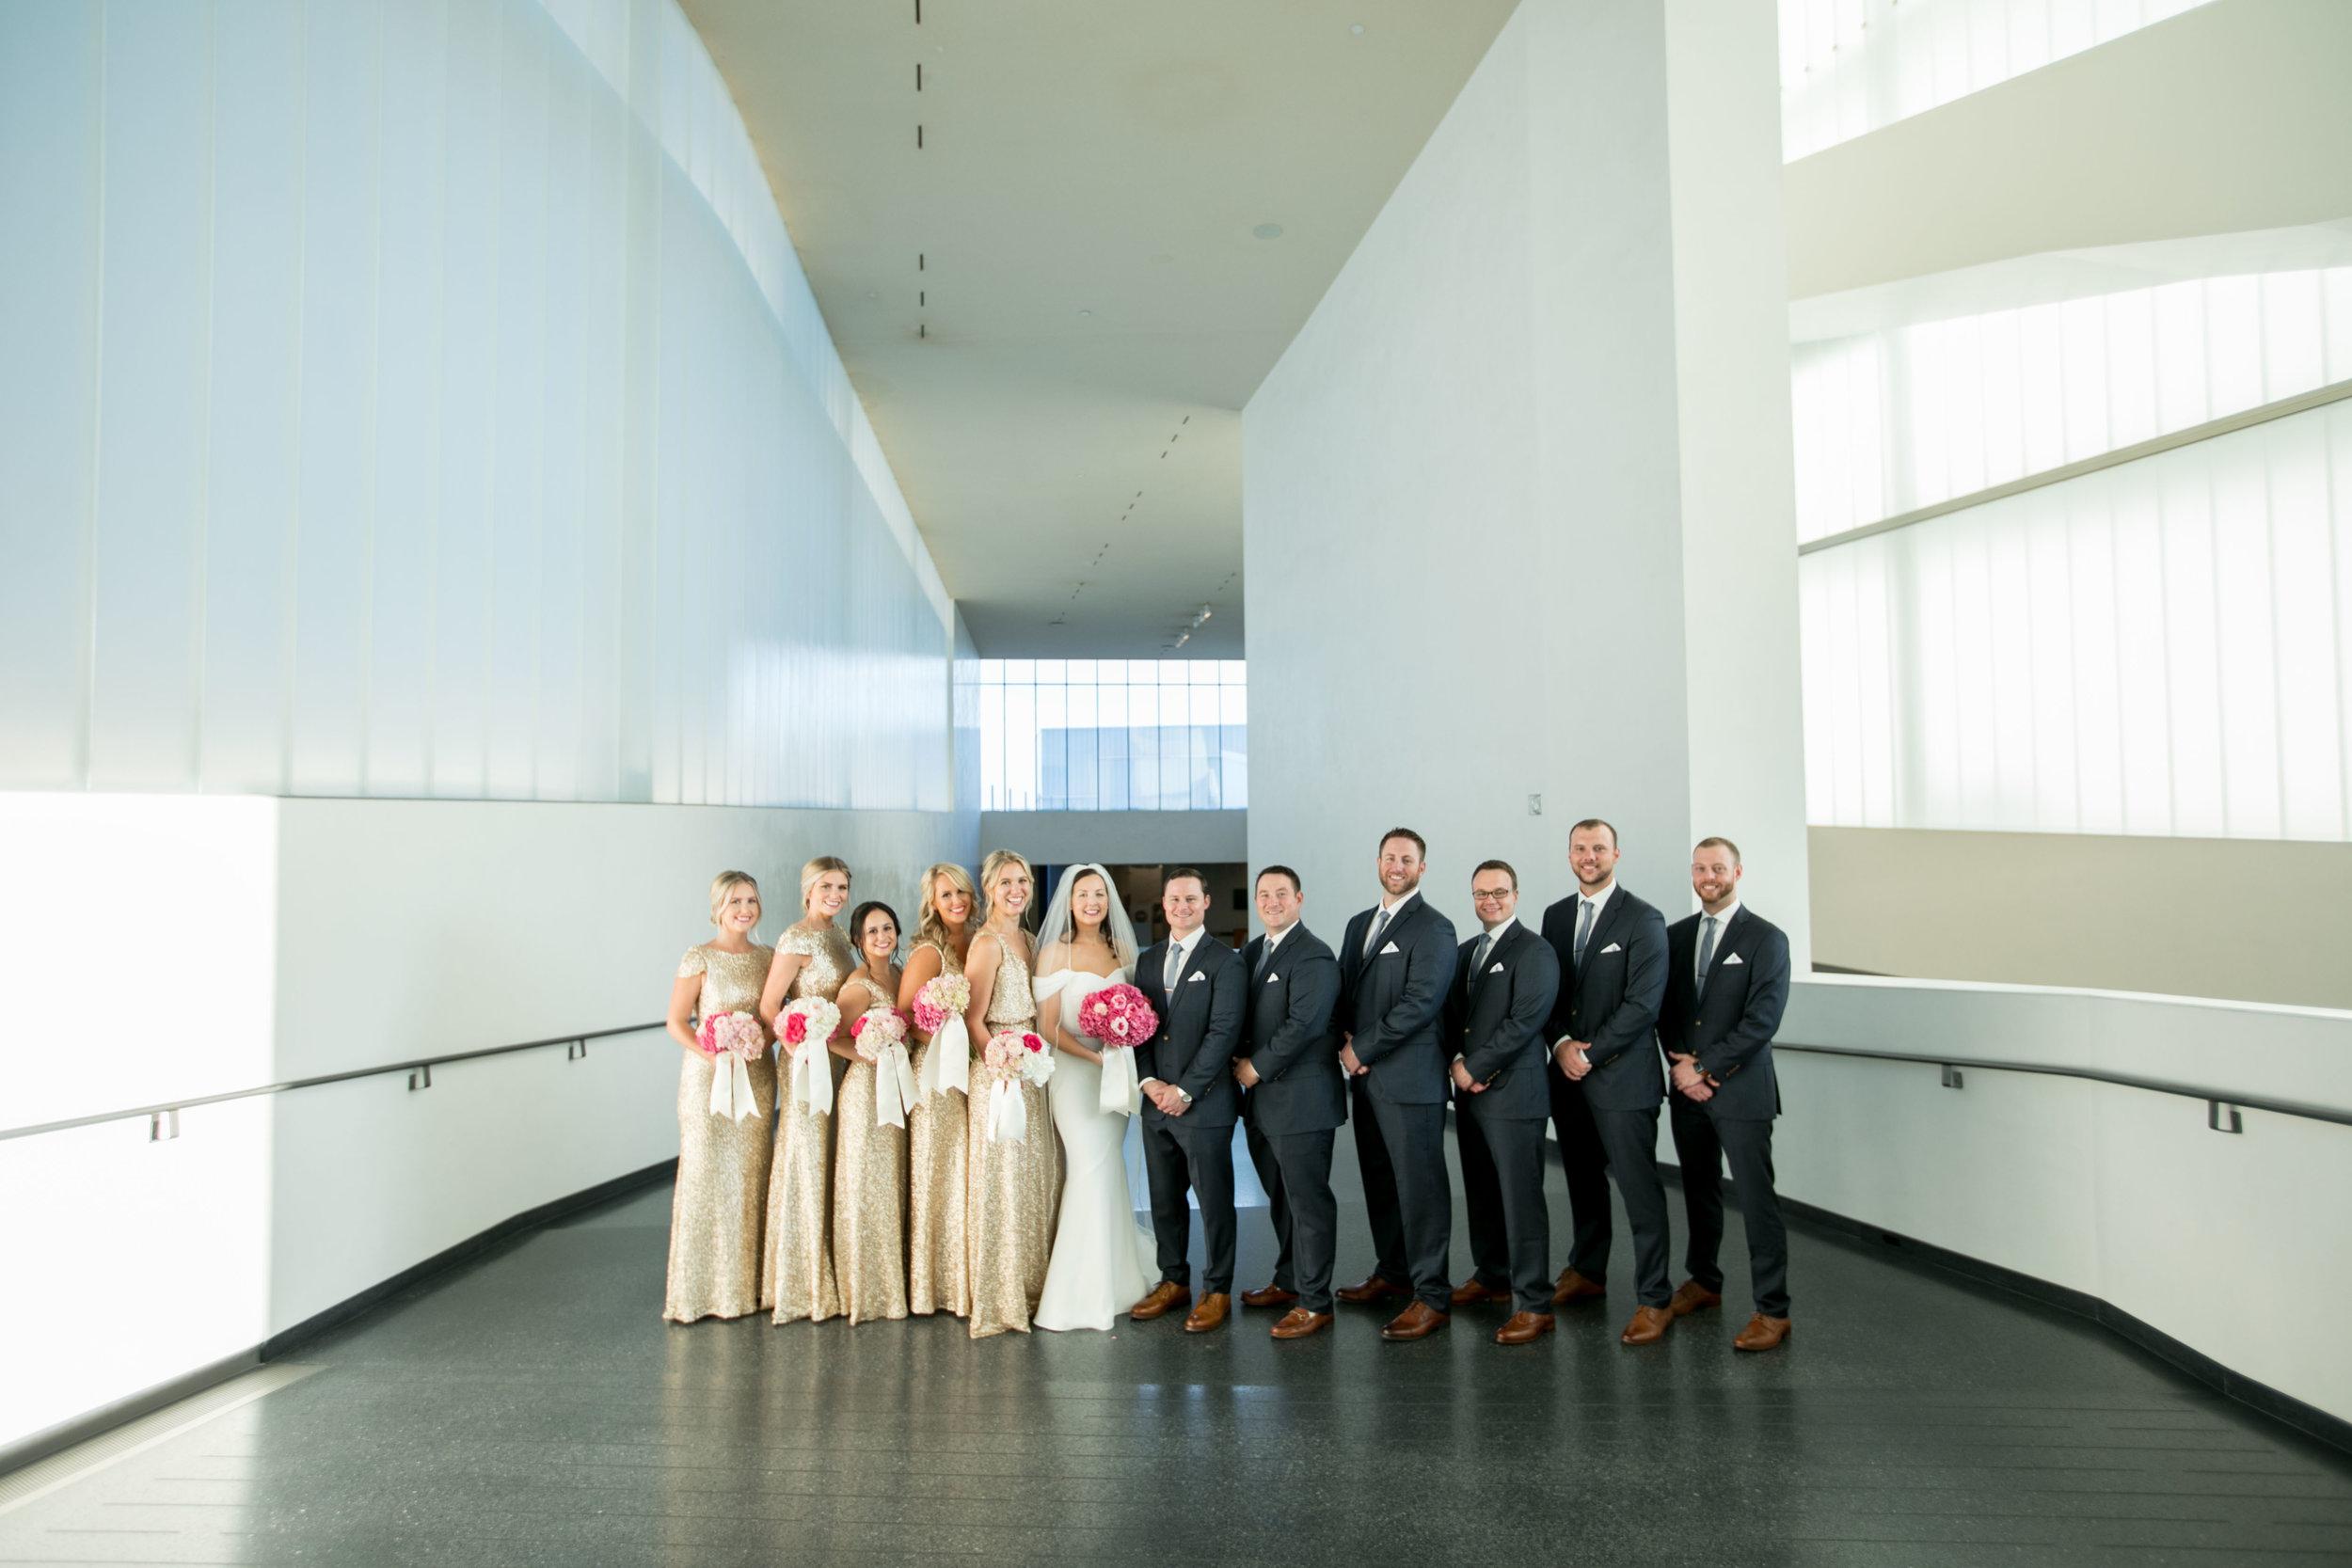 nelson-atkins-wedding-51.jpg